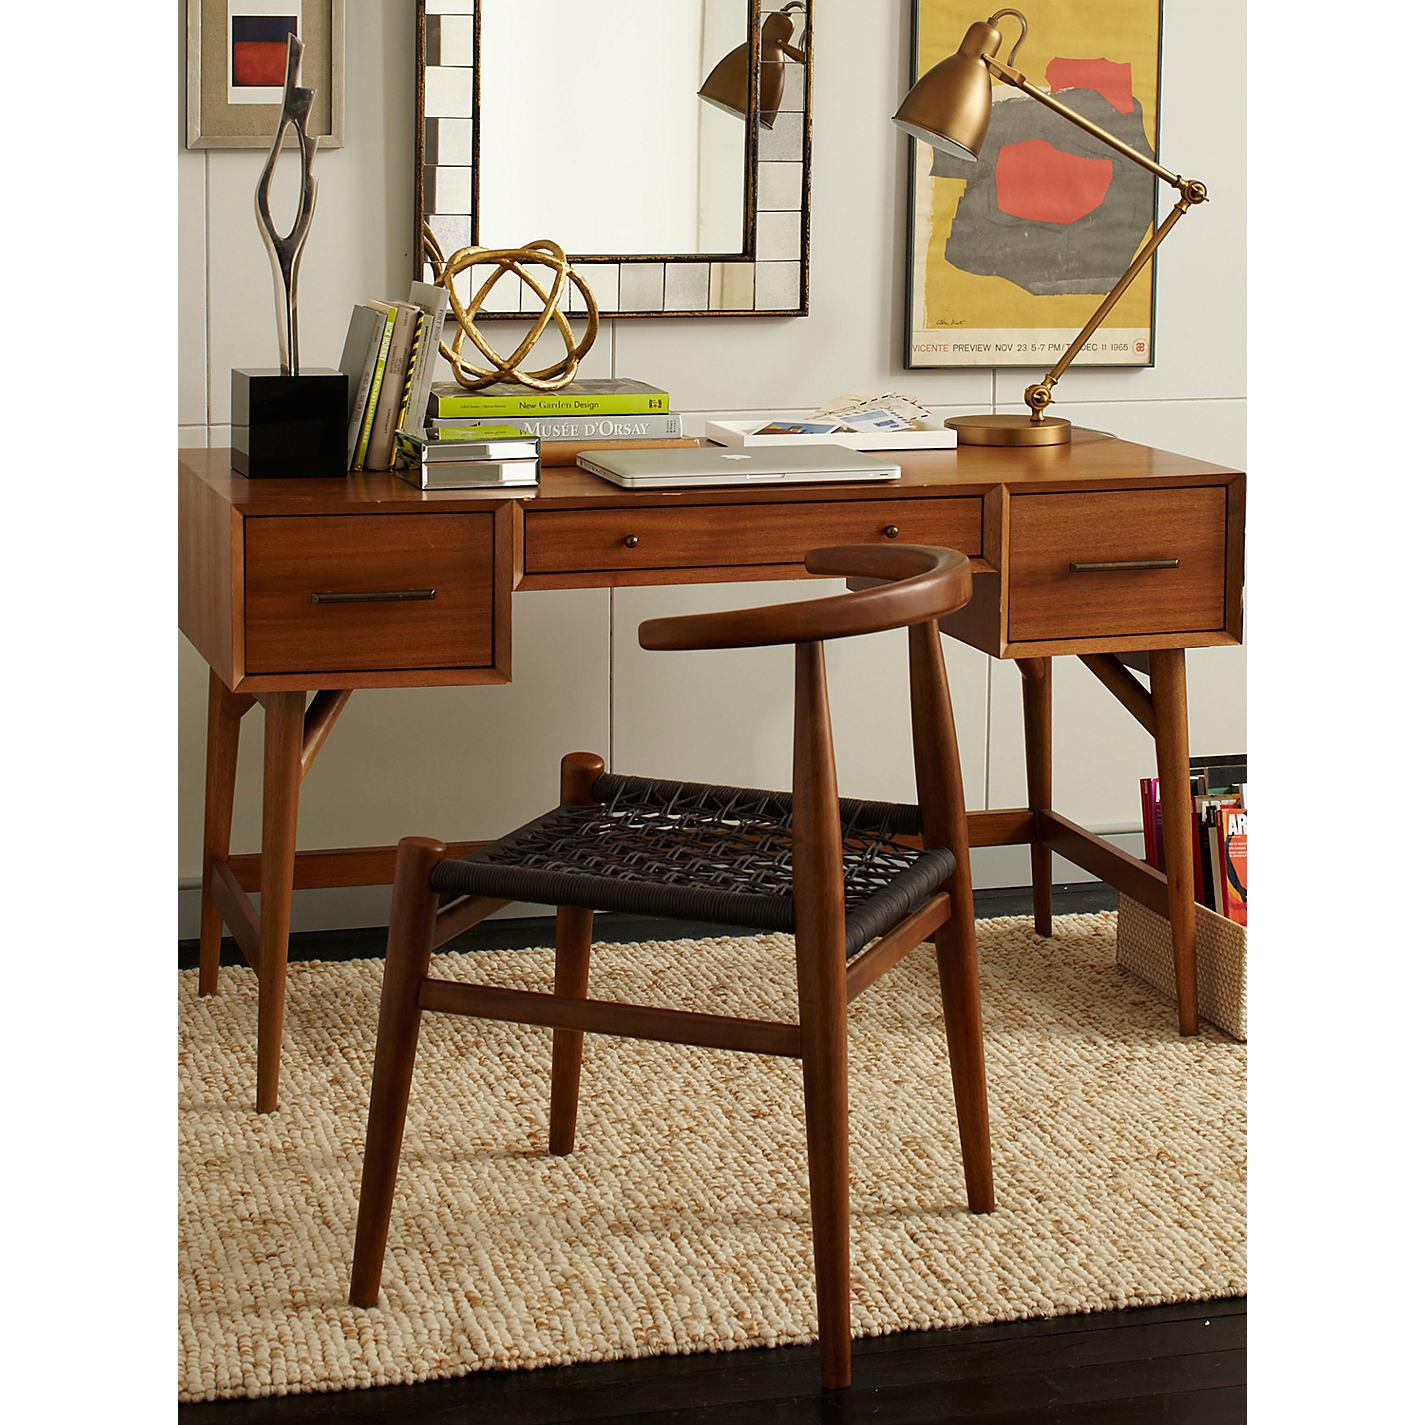 Buy west elm Mid Century Office Furniture Range Online at johnlewis com. Buy west elm Mid Century Office Furniture Range   John Lewis